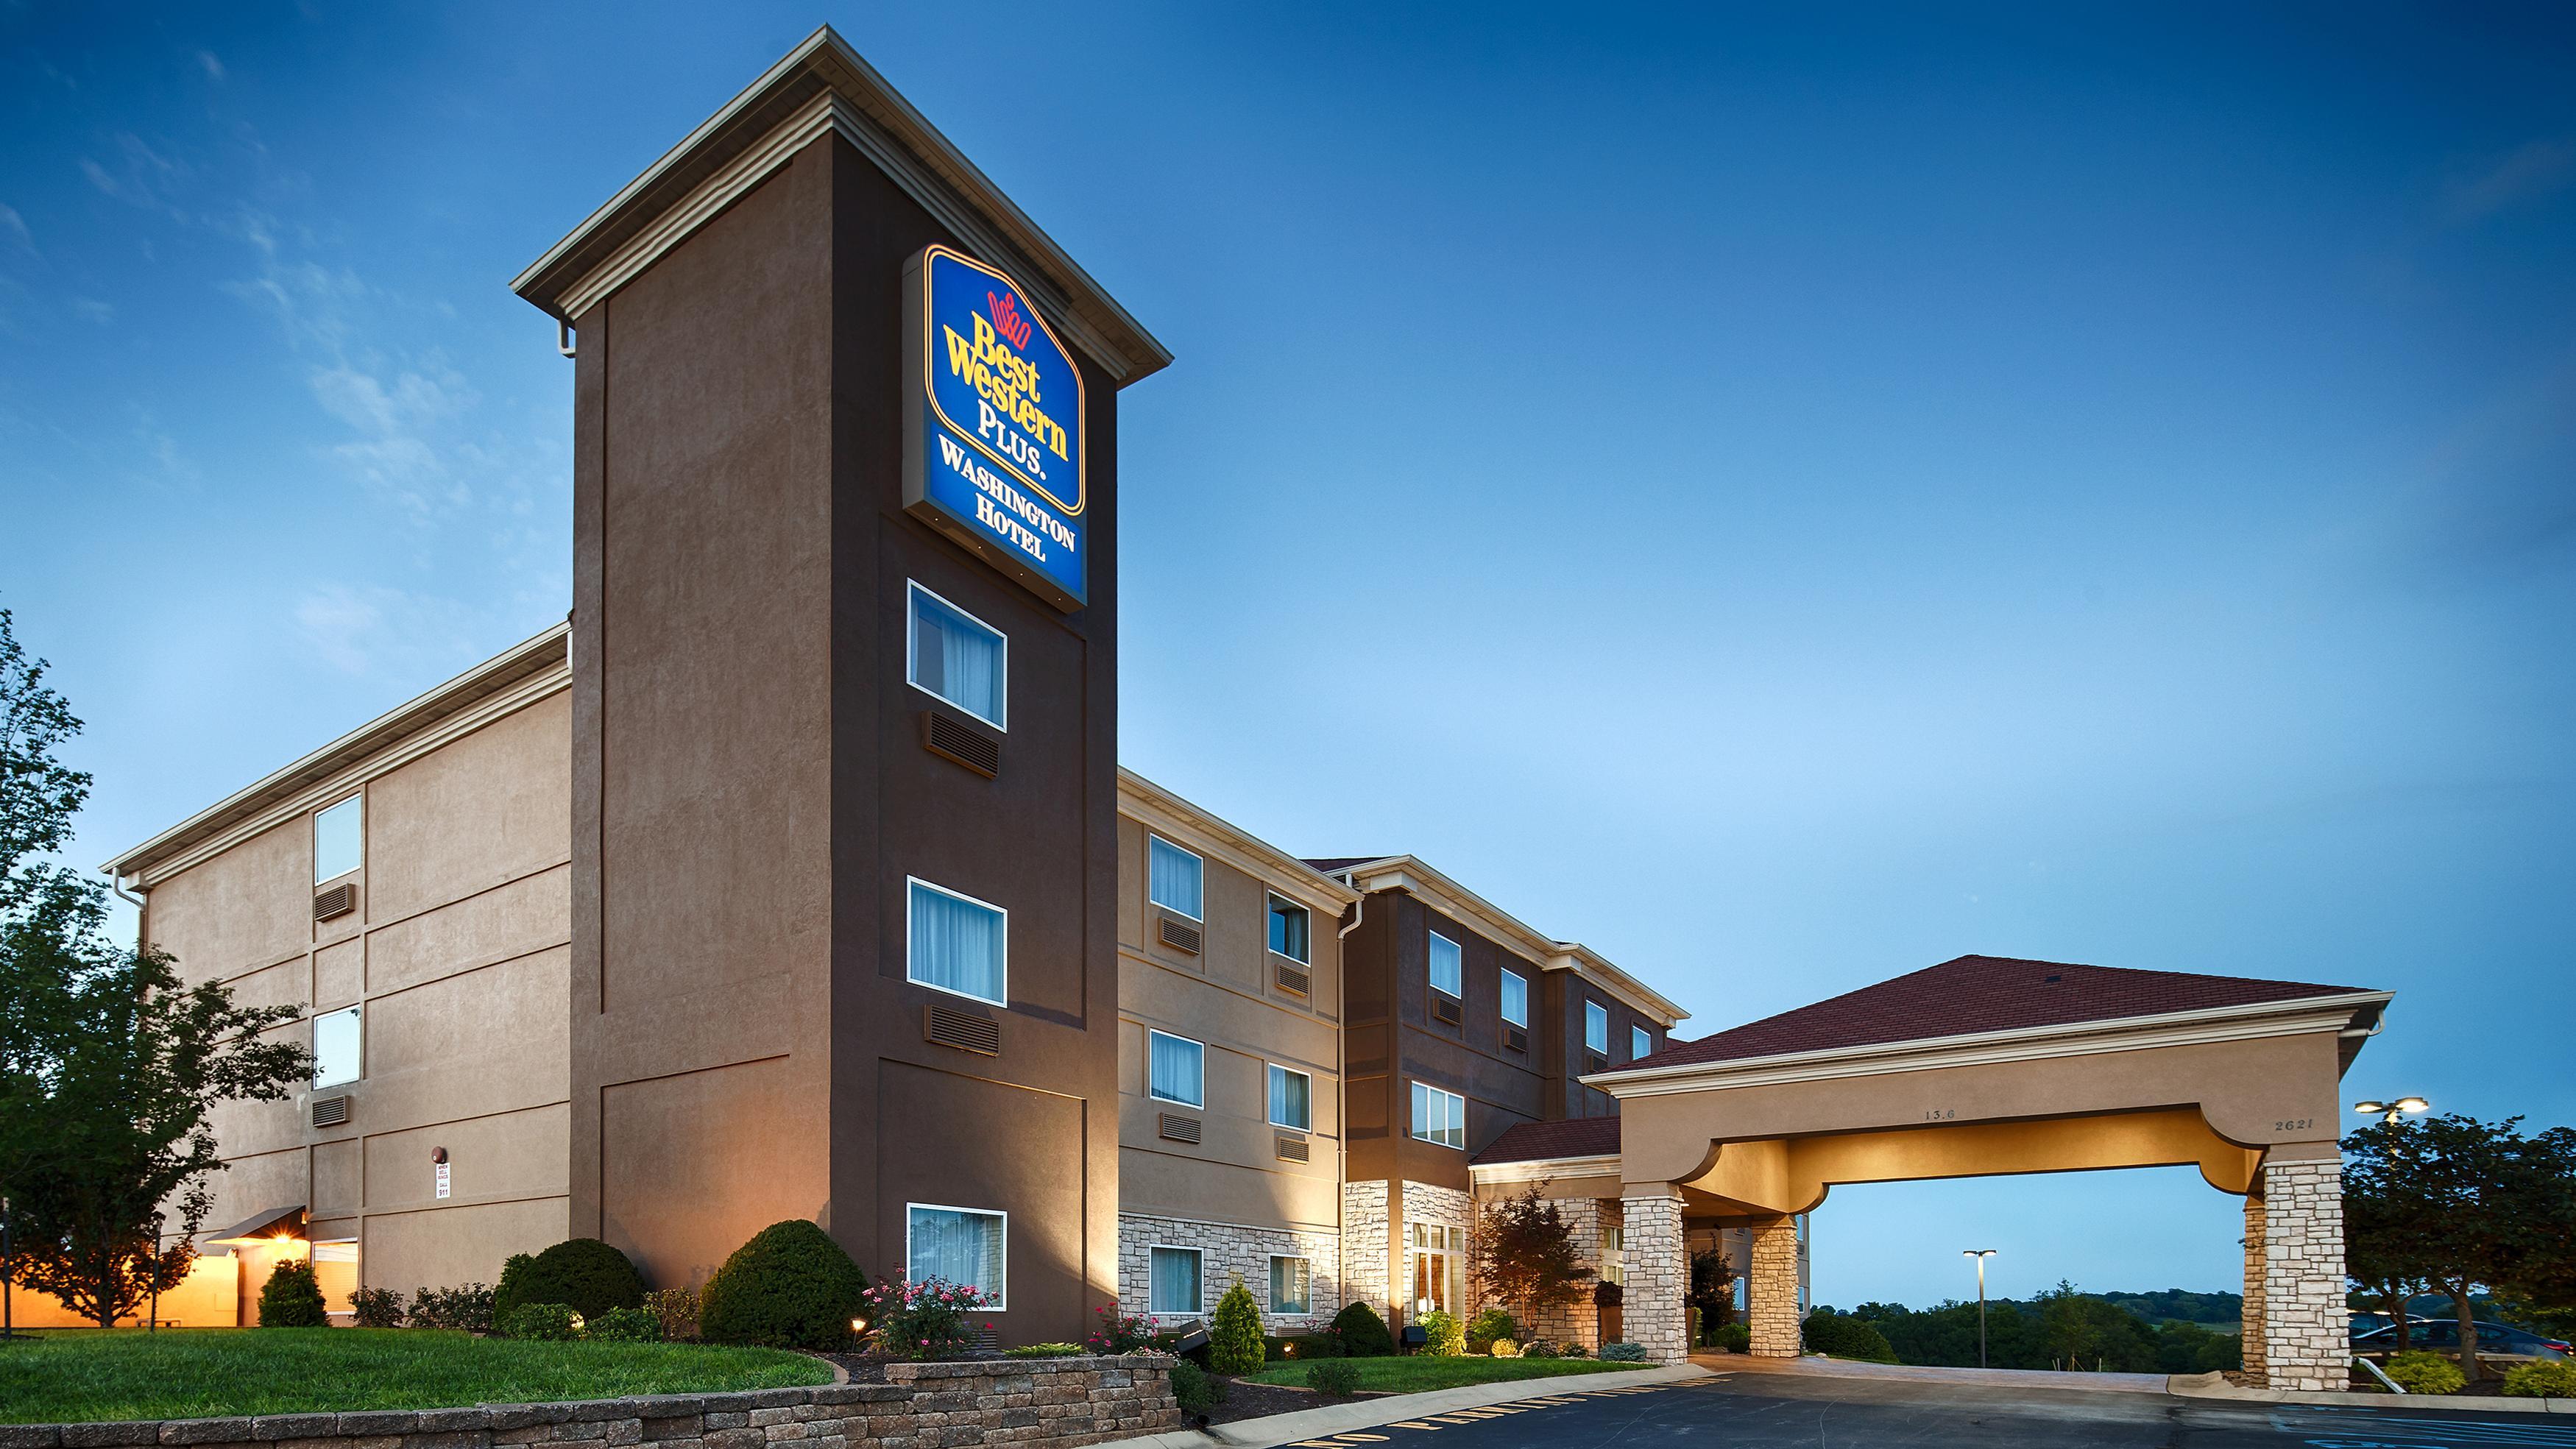 BEST WESTERN PLUS Washington Hotel